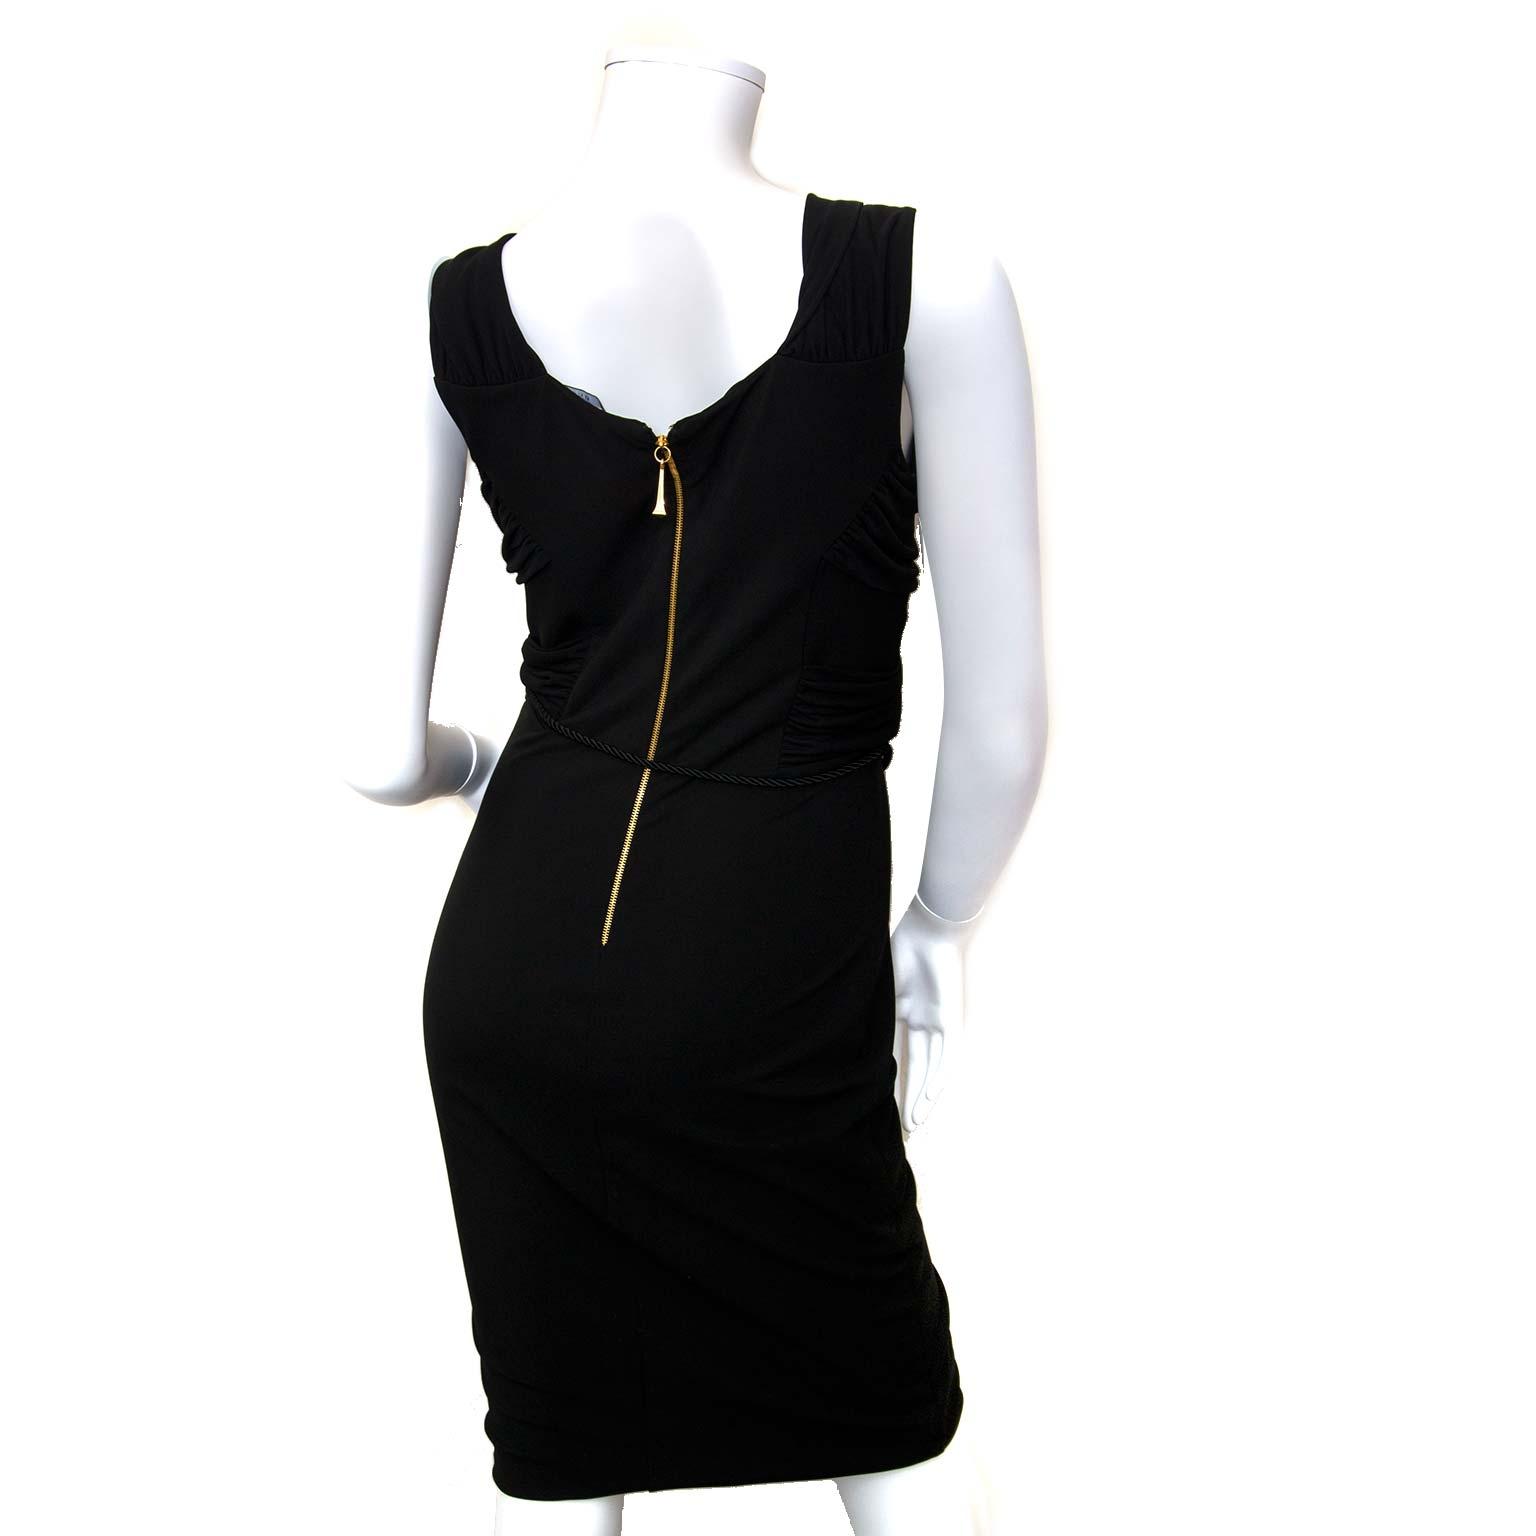 buy authentic gucci black tie knot dress now at labellov vintage fashion webshop belgium